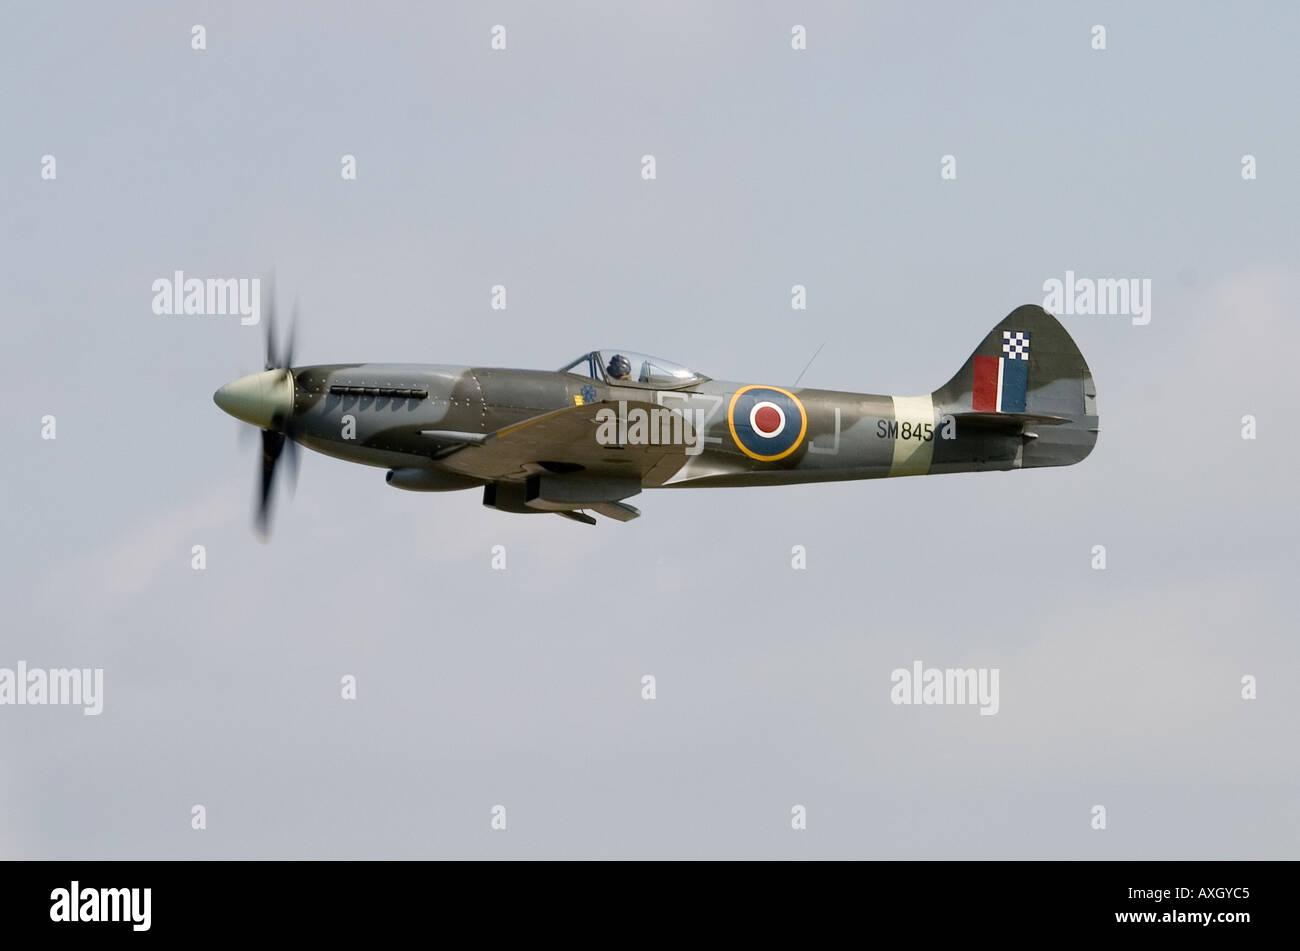 Supermarine Spitfire FR XVIII SM845 - Stock Image